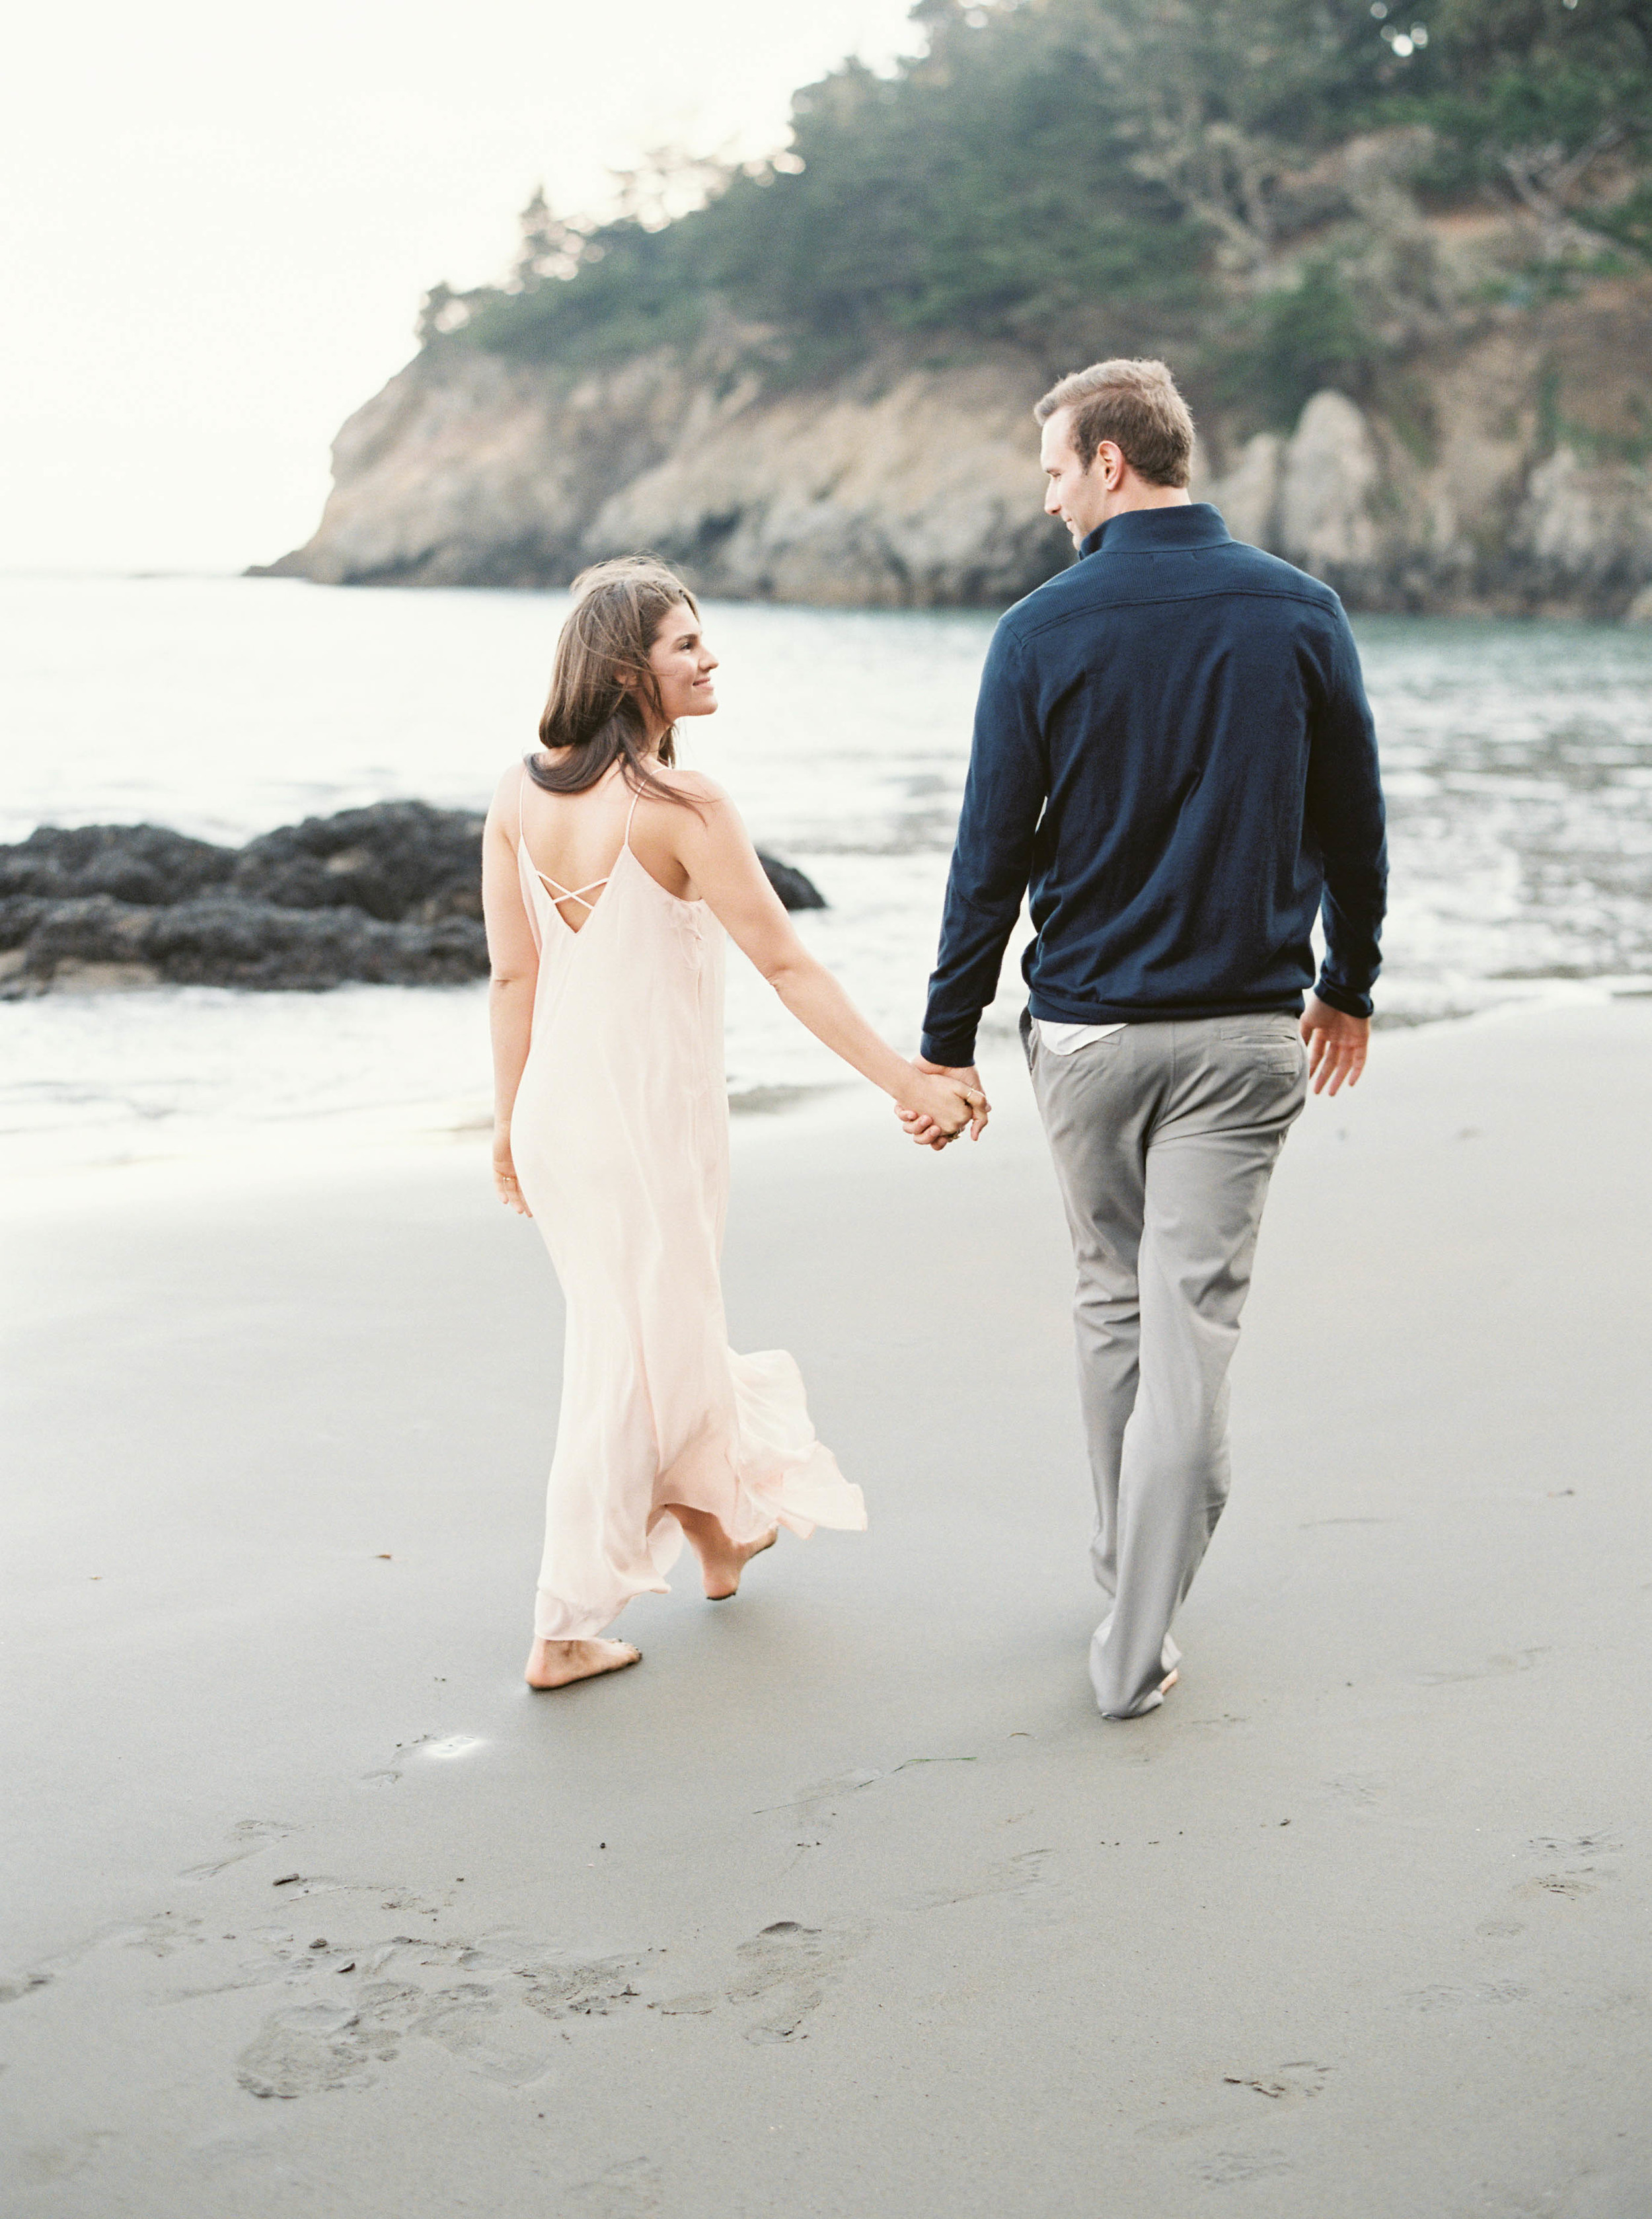 Meghan Mehan Photography - Fine Art Film Wedding Photography - San Francisco | Napa | Sonoma | Big Sur | Santa Barbara - 101.jpg